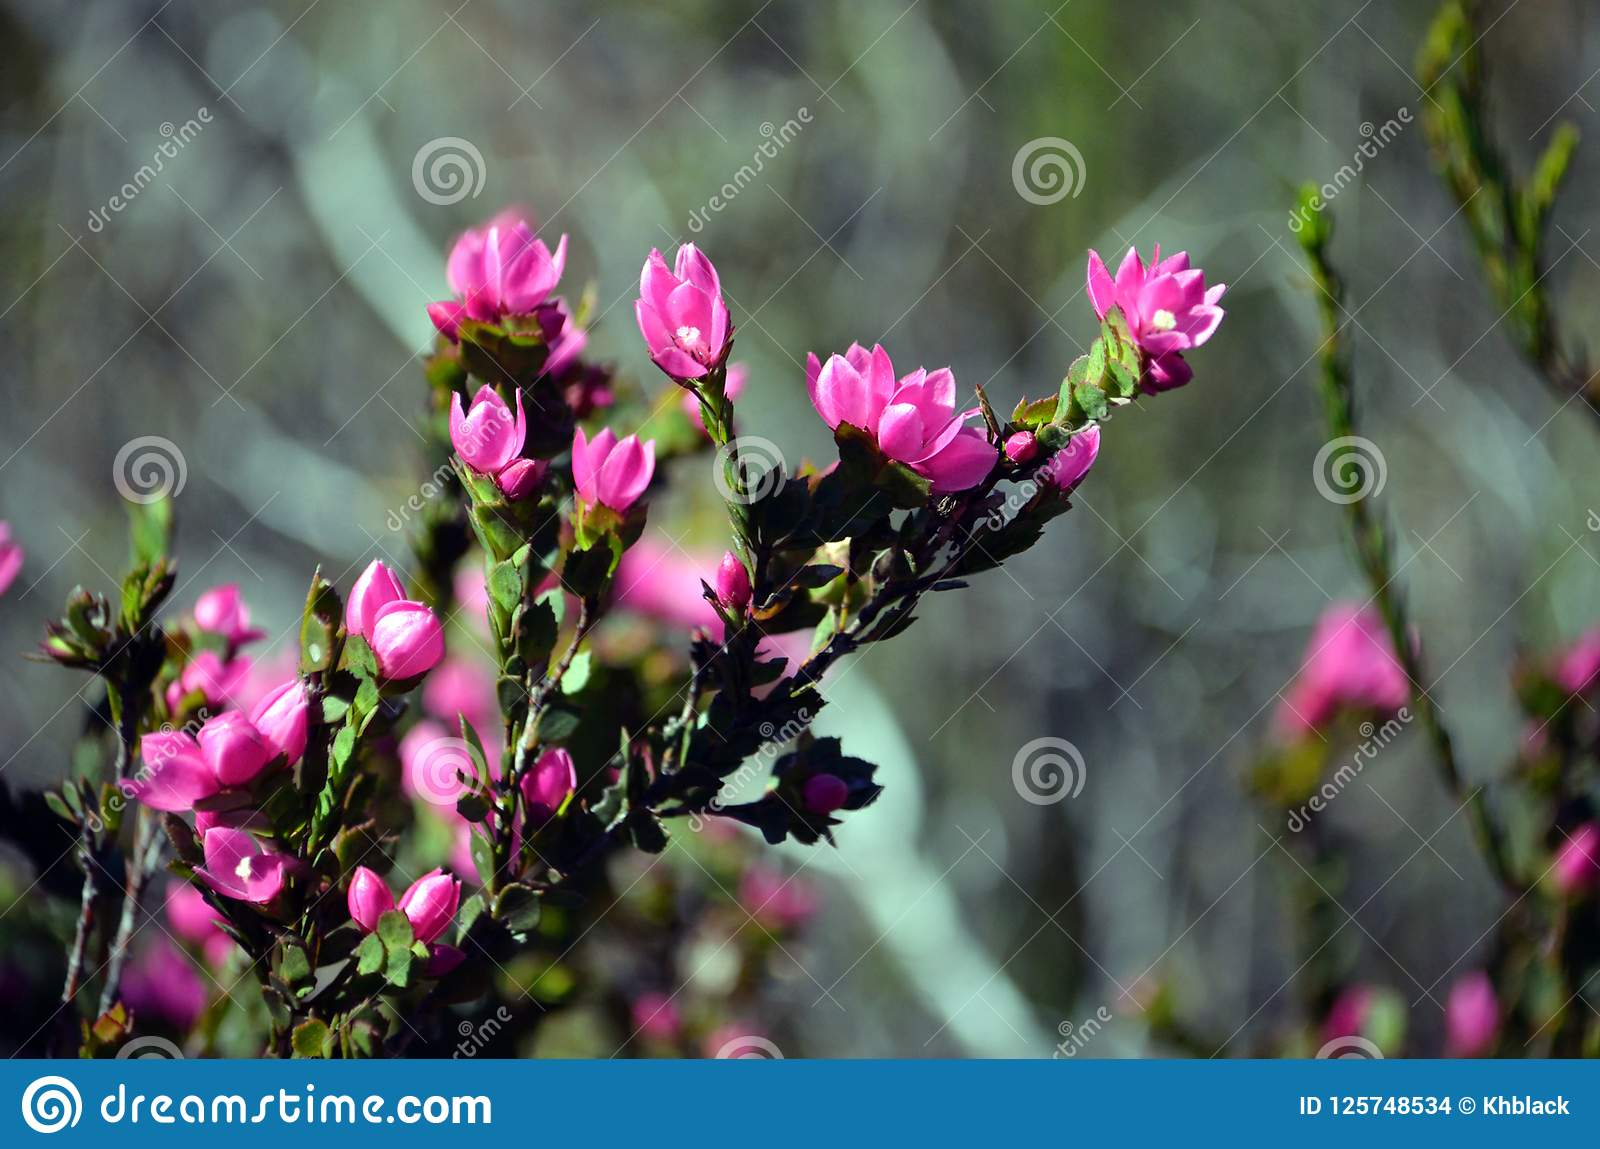 Deep pink flowers of the australian native rose stock photo image download deep pink flowers of the australian native rose stock photo image of flower mightylinksfo